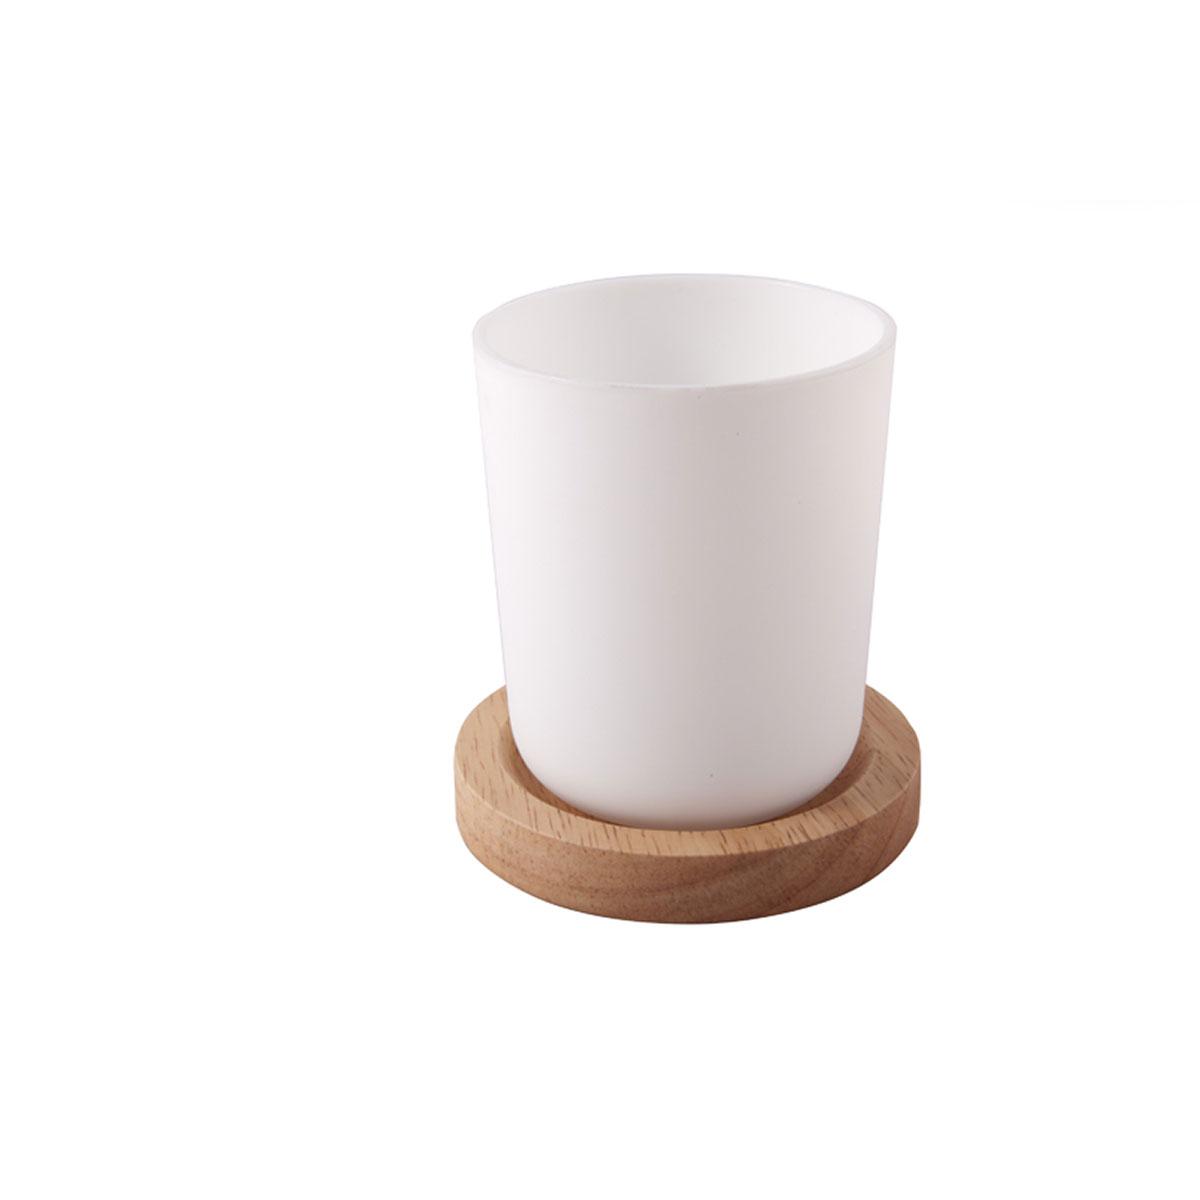 Gobelet blanc et socle en bois d'hévéa